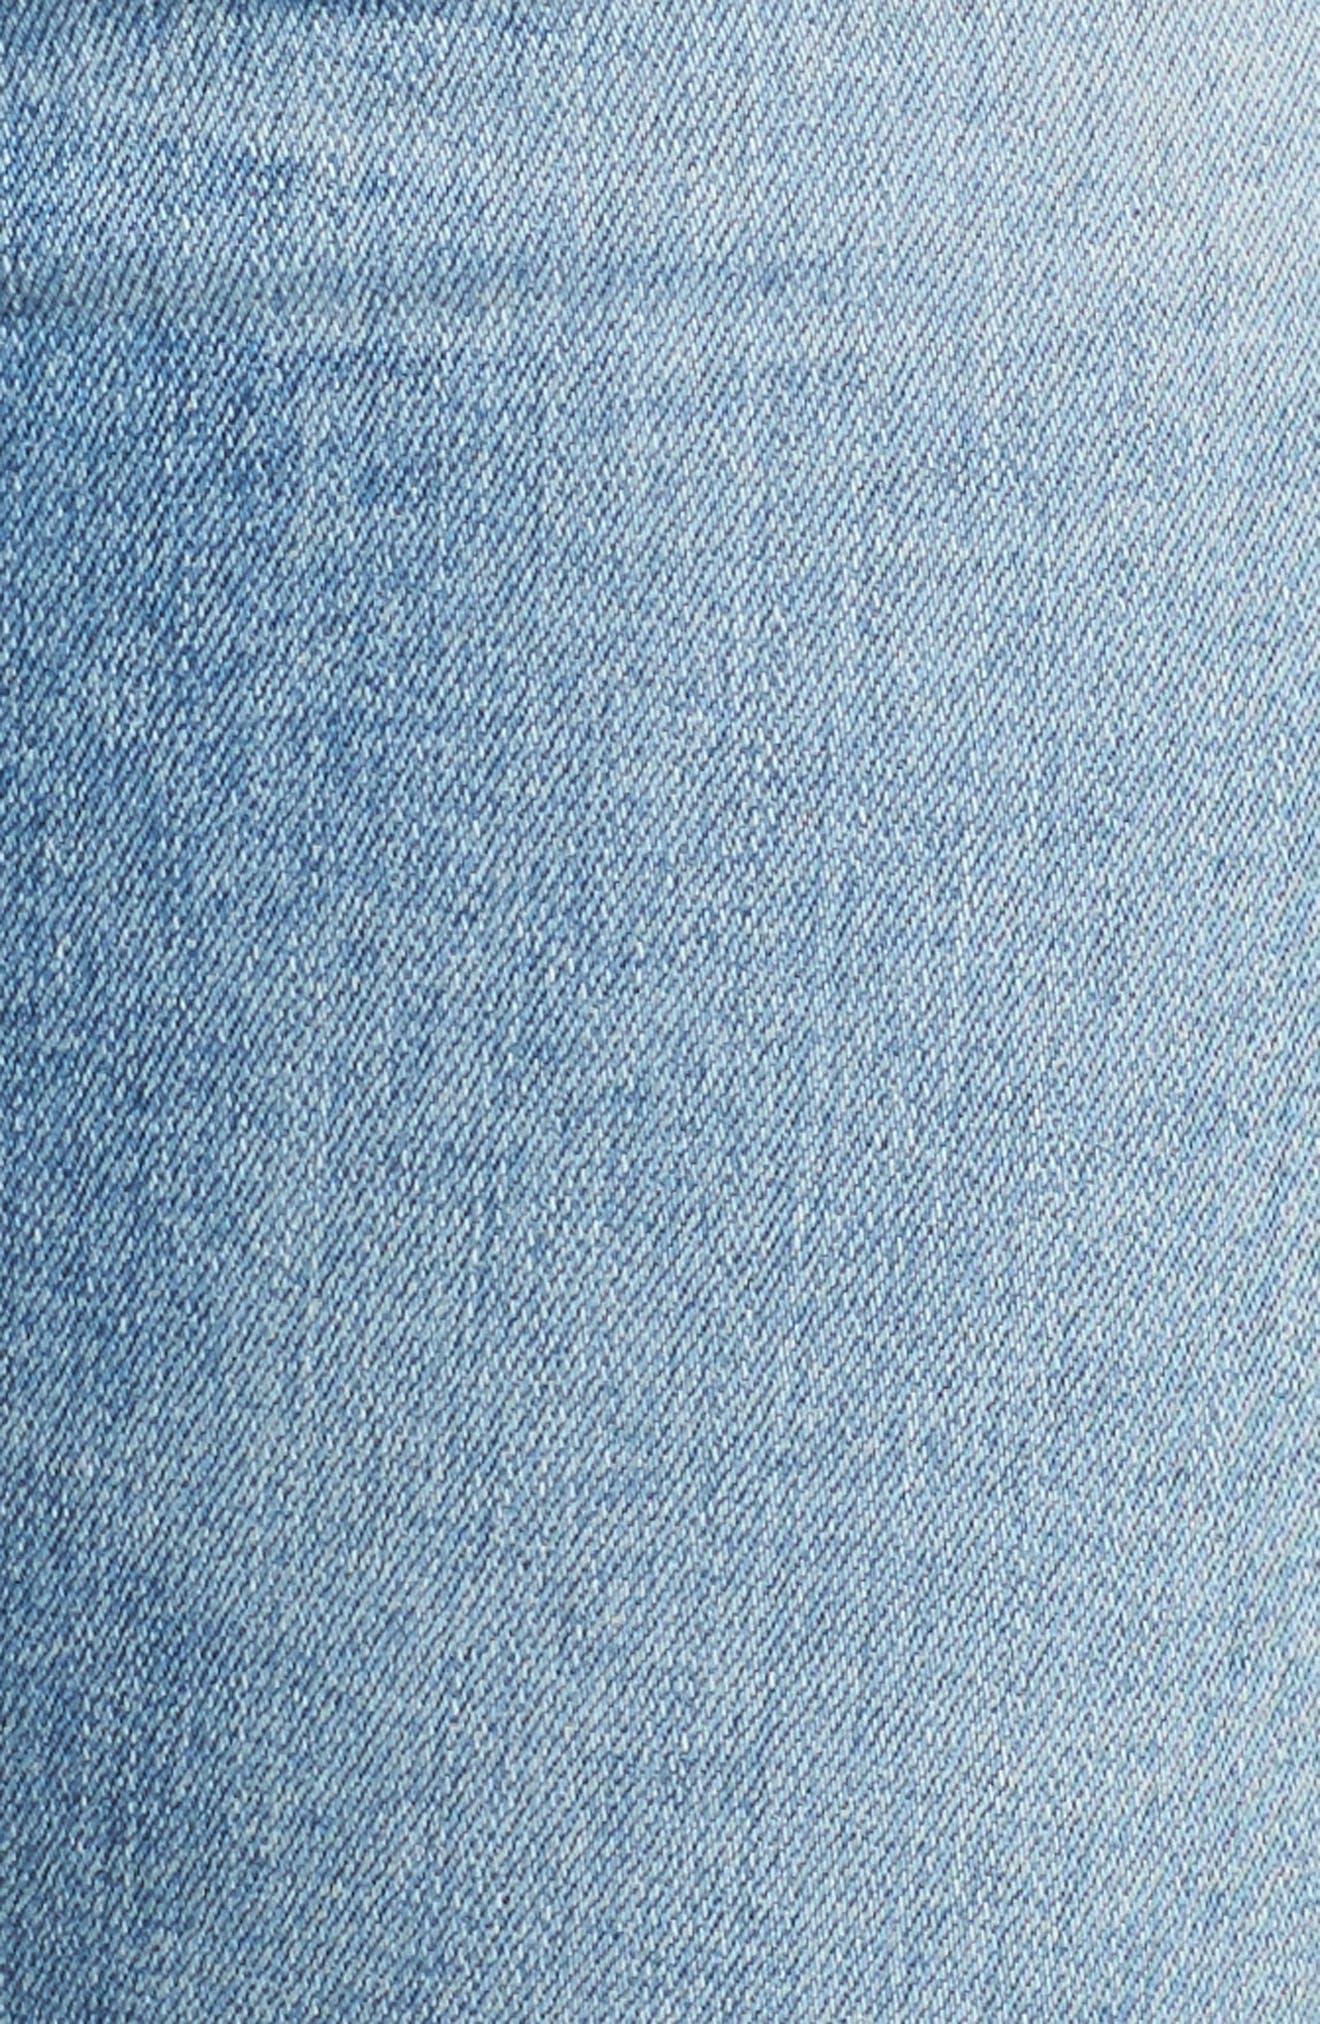 The Farrah High Waist Ankle Skinny Jeans,                             Alternate thumbnail 6, color,                             18 Years Cruising